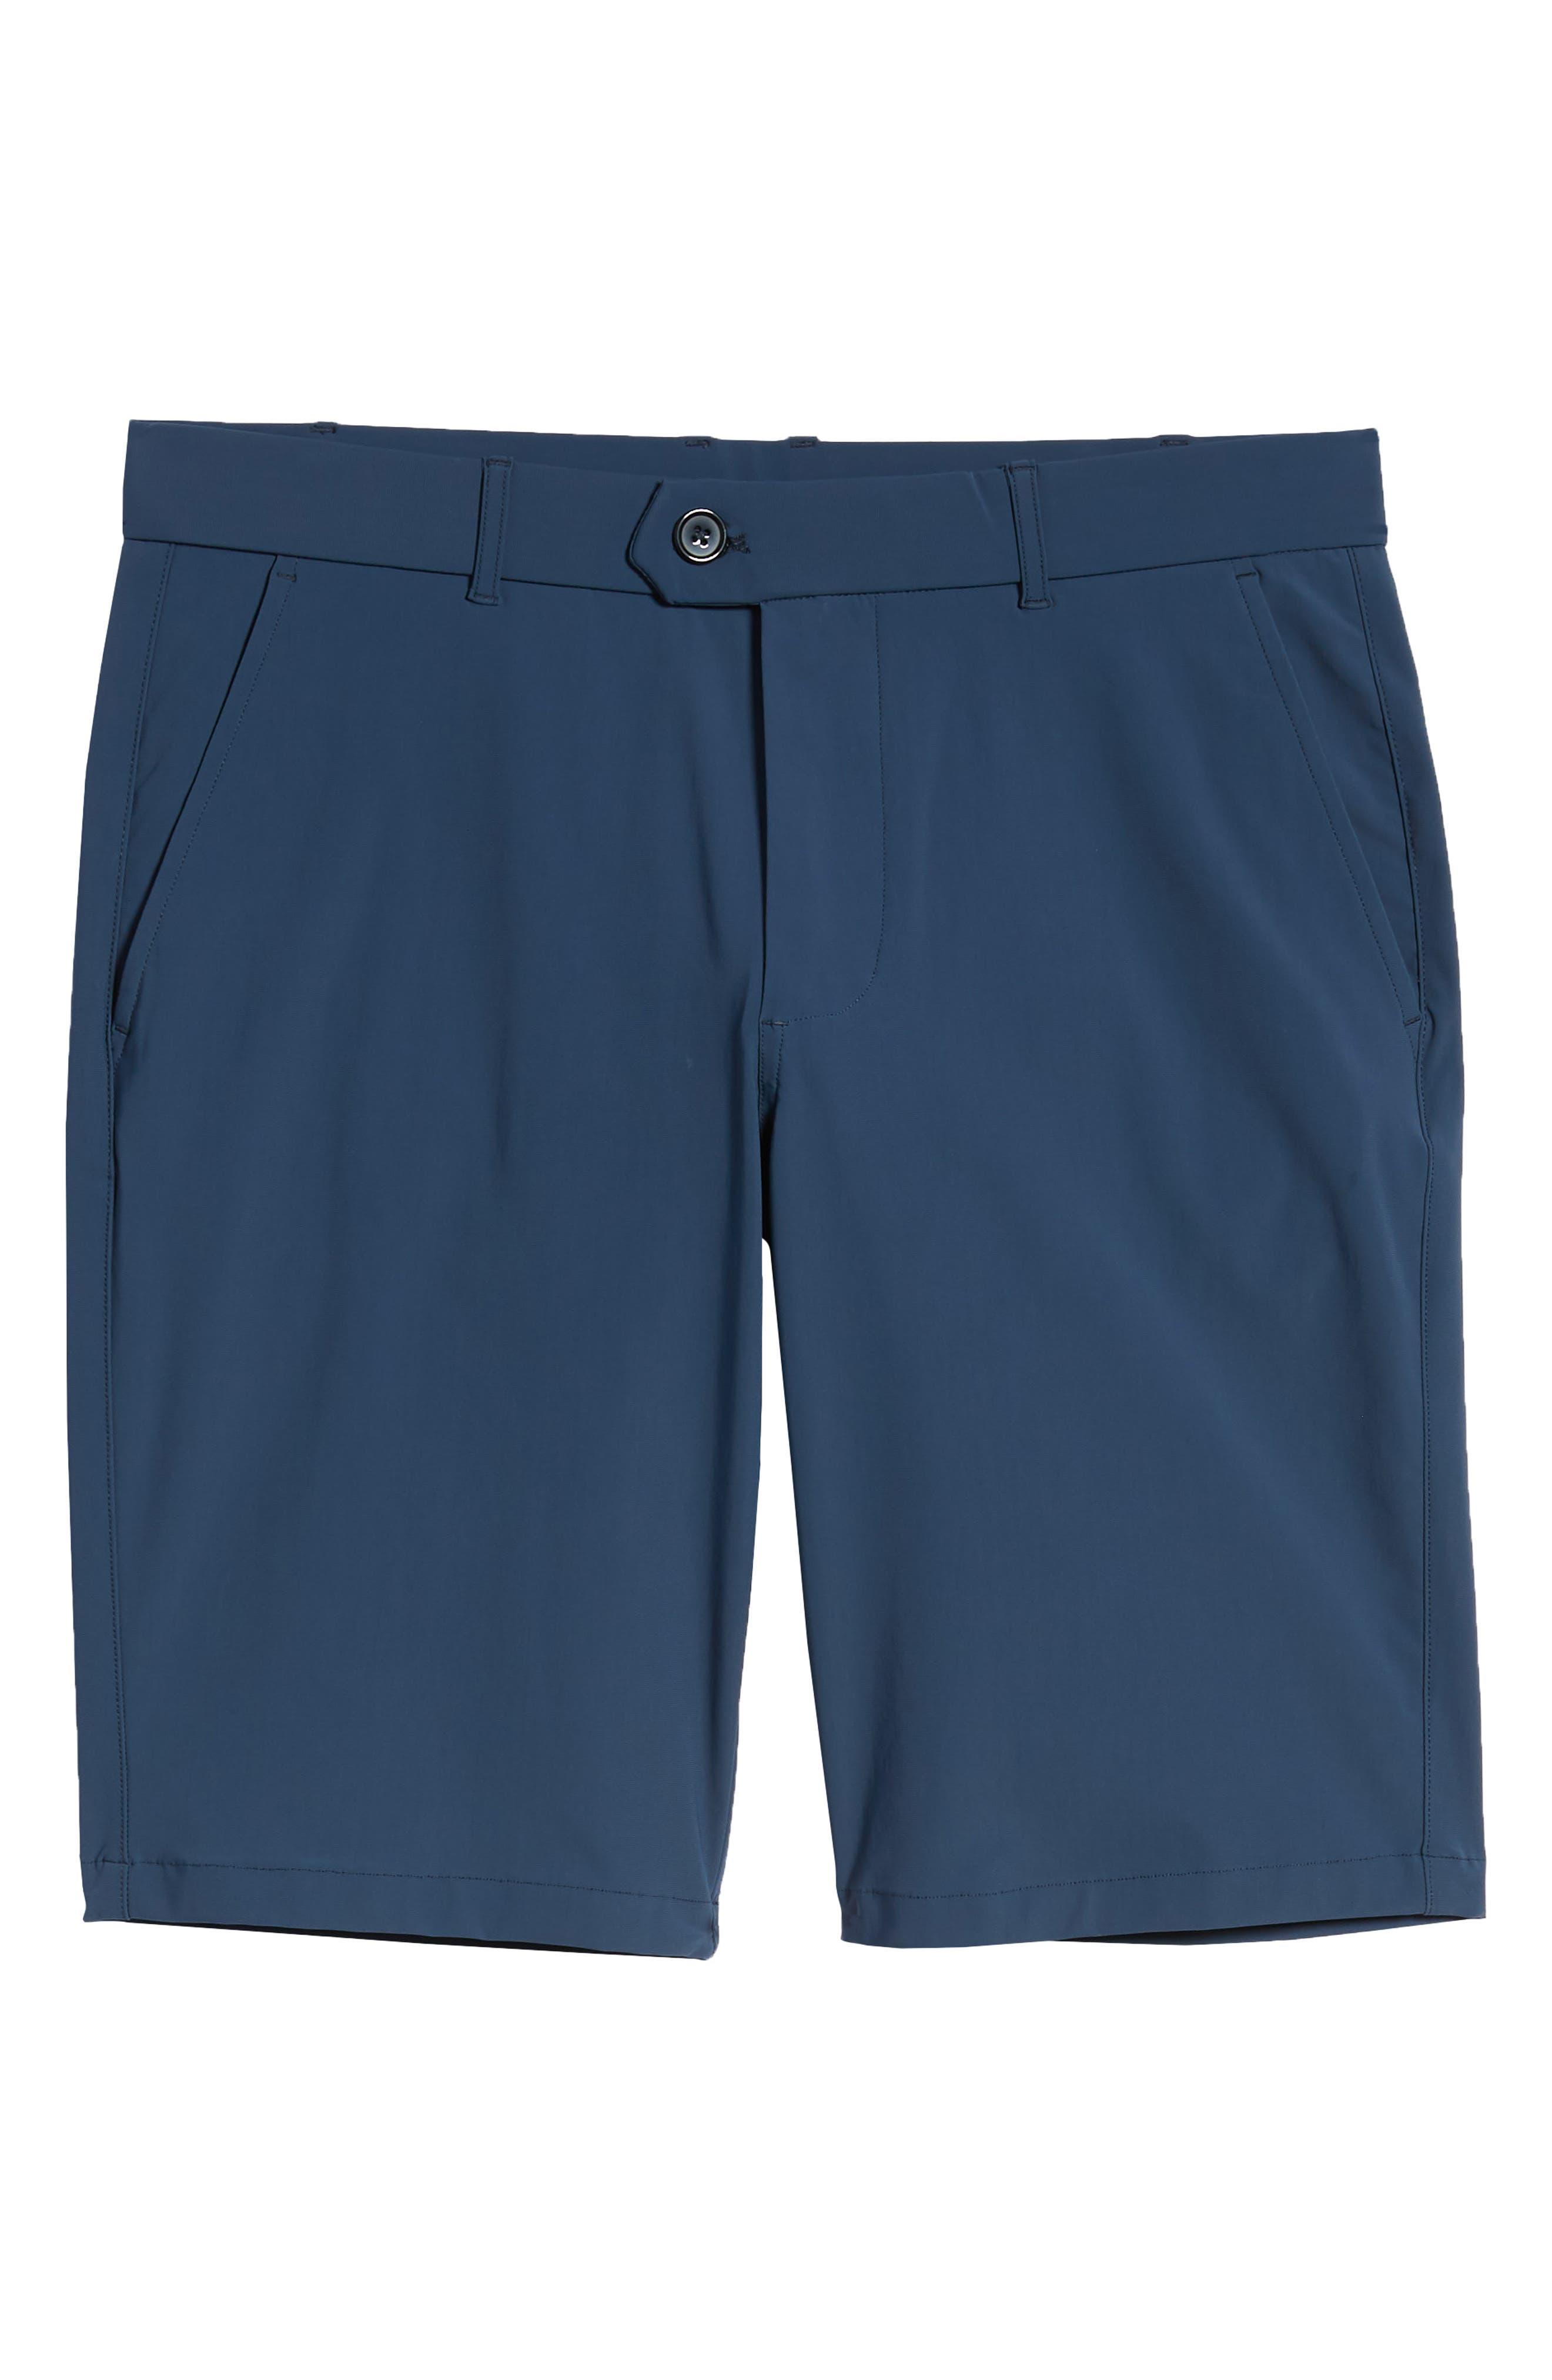 GREYSON, Montauk Technical Shorts, Alternate thumbnail 7, color, EEL